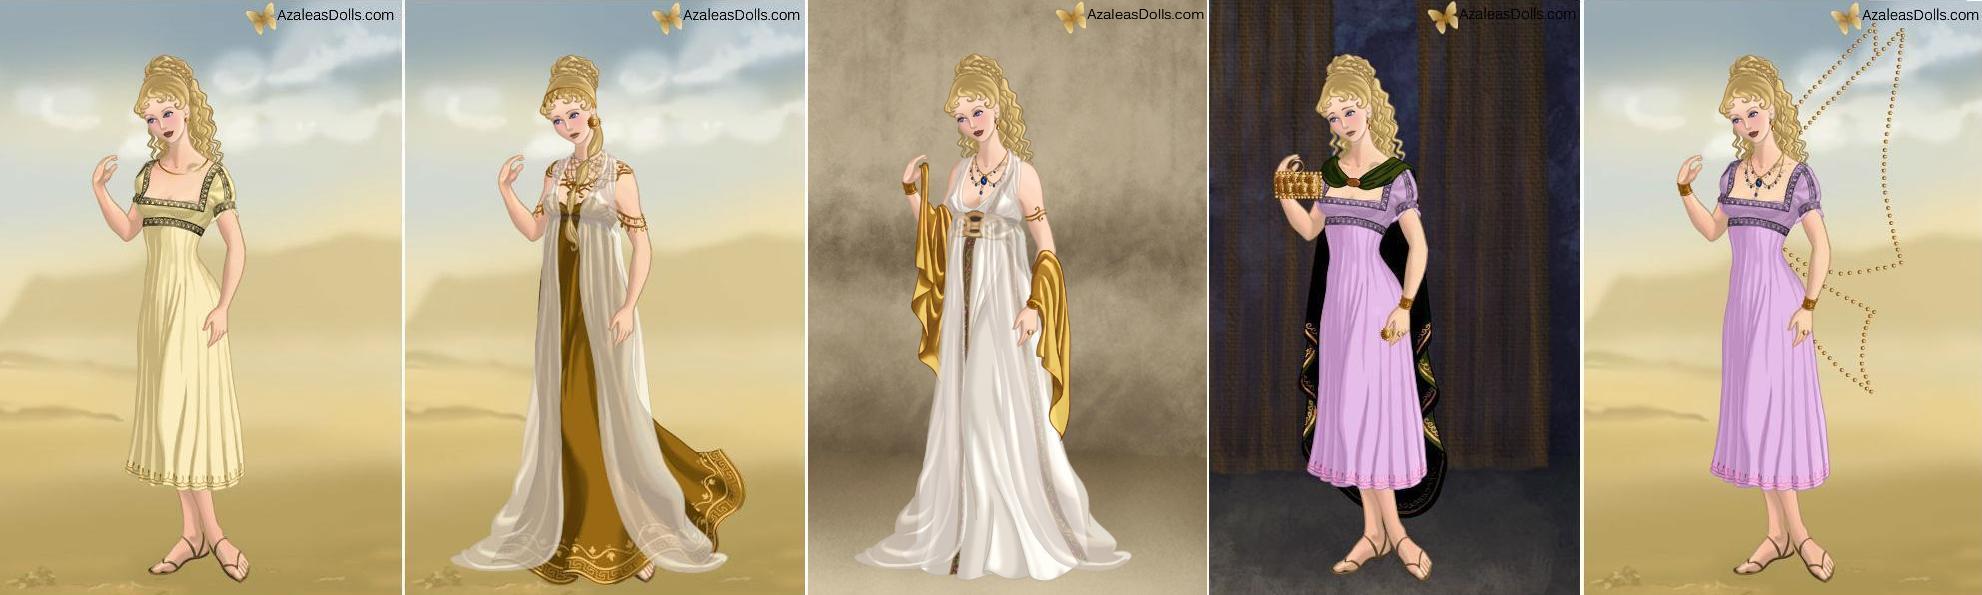 princess psyche goddess of the soul by tffan234 on deviantart